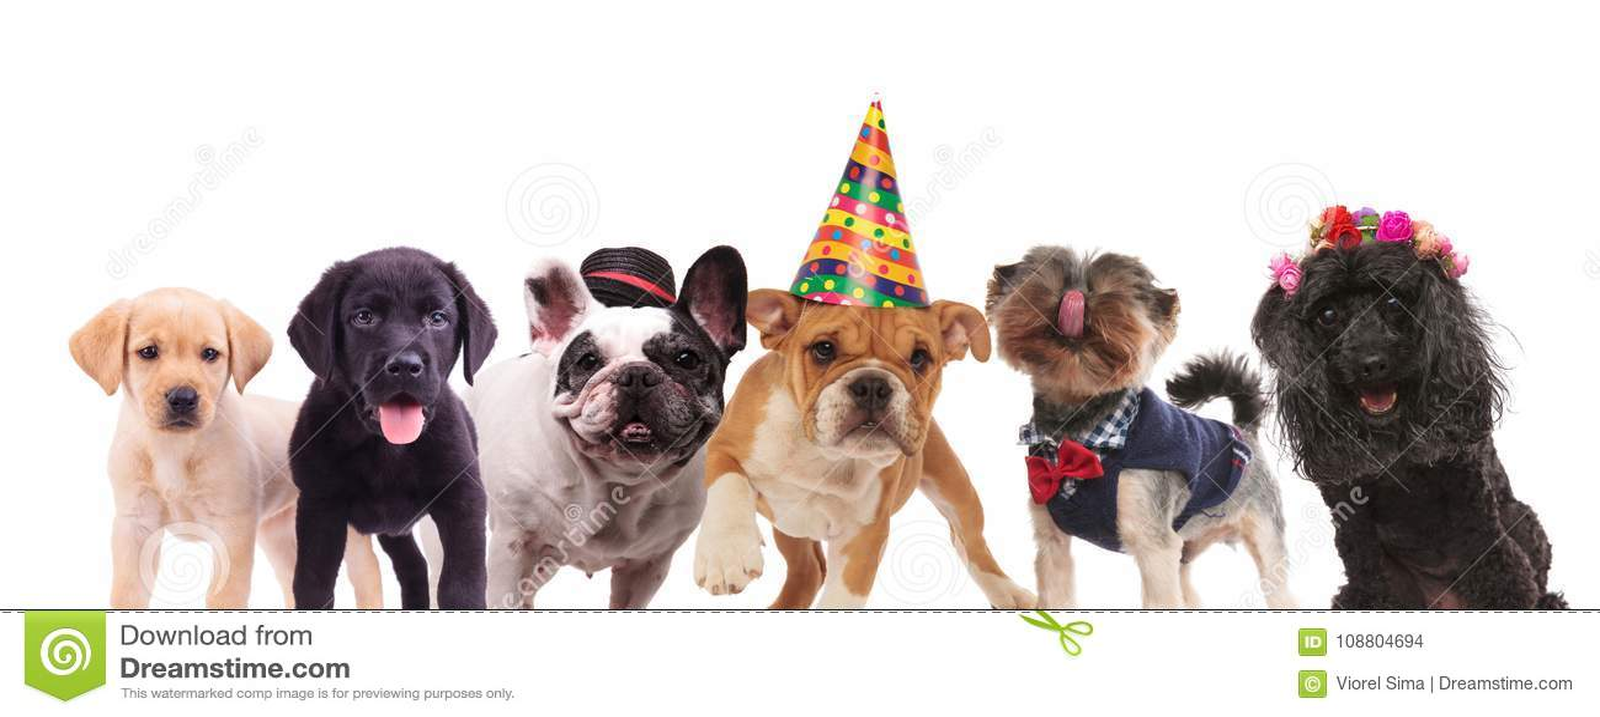 Grupo de perros lindos que se unen